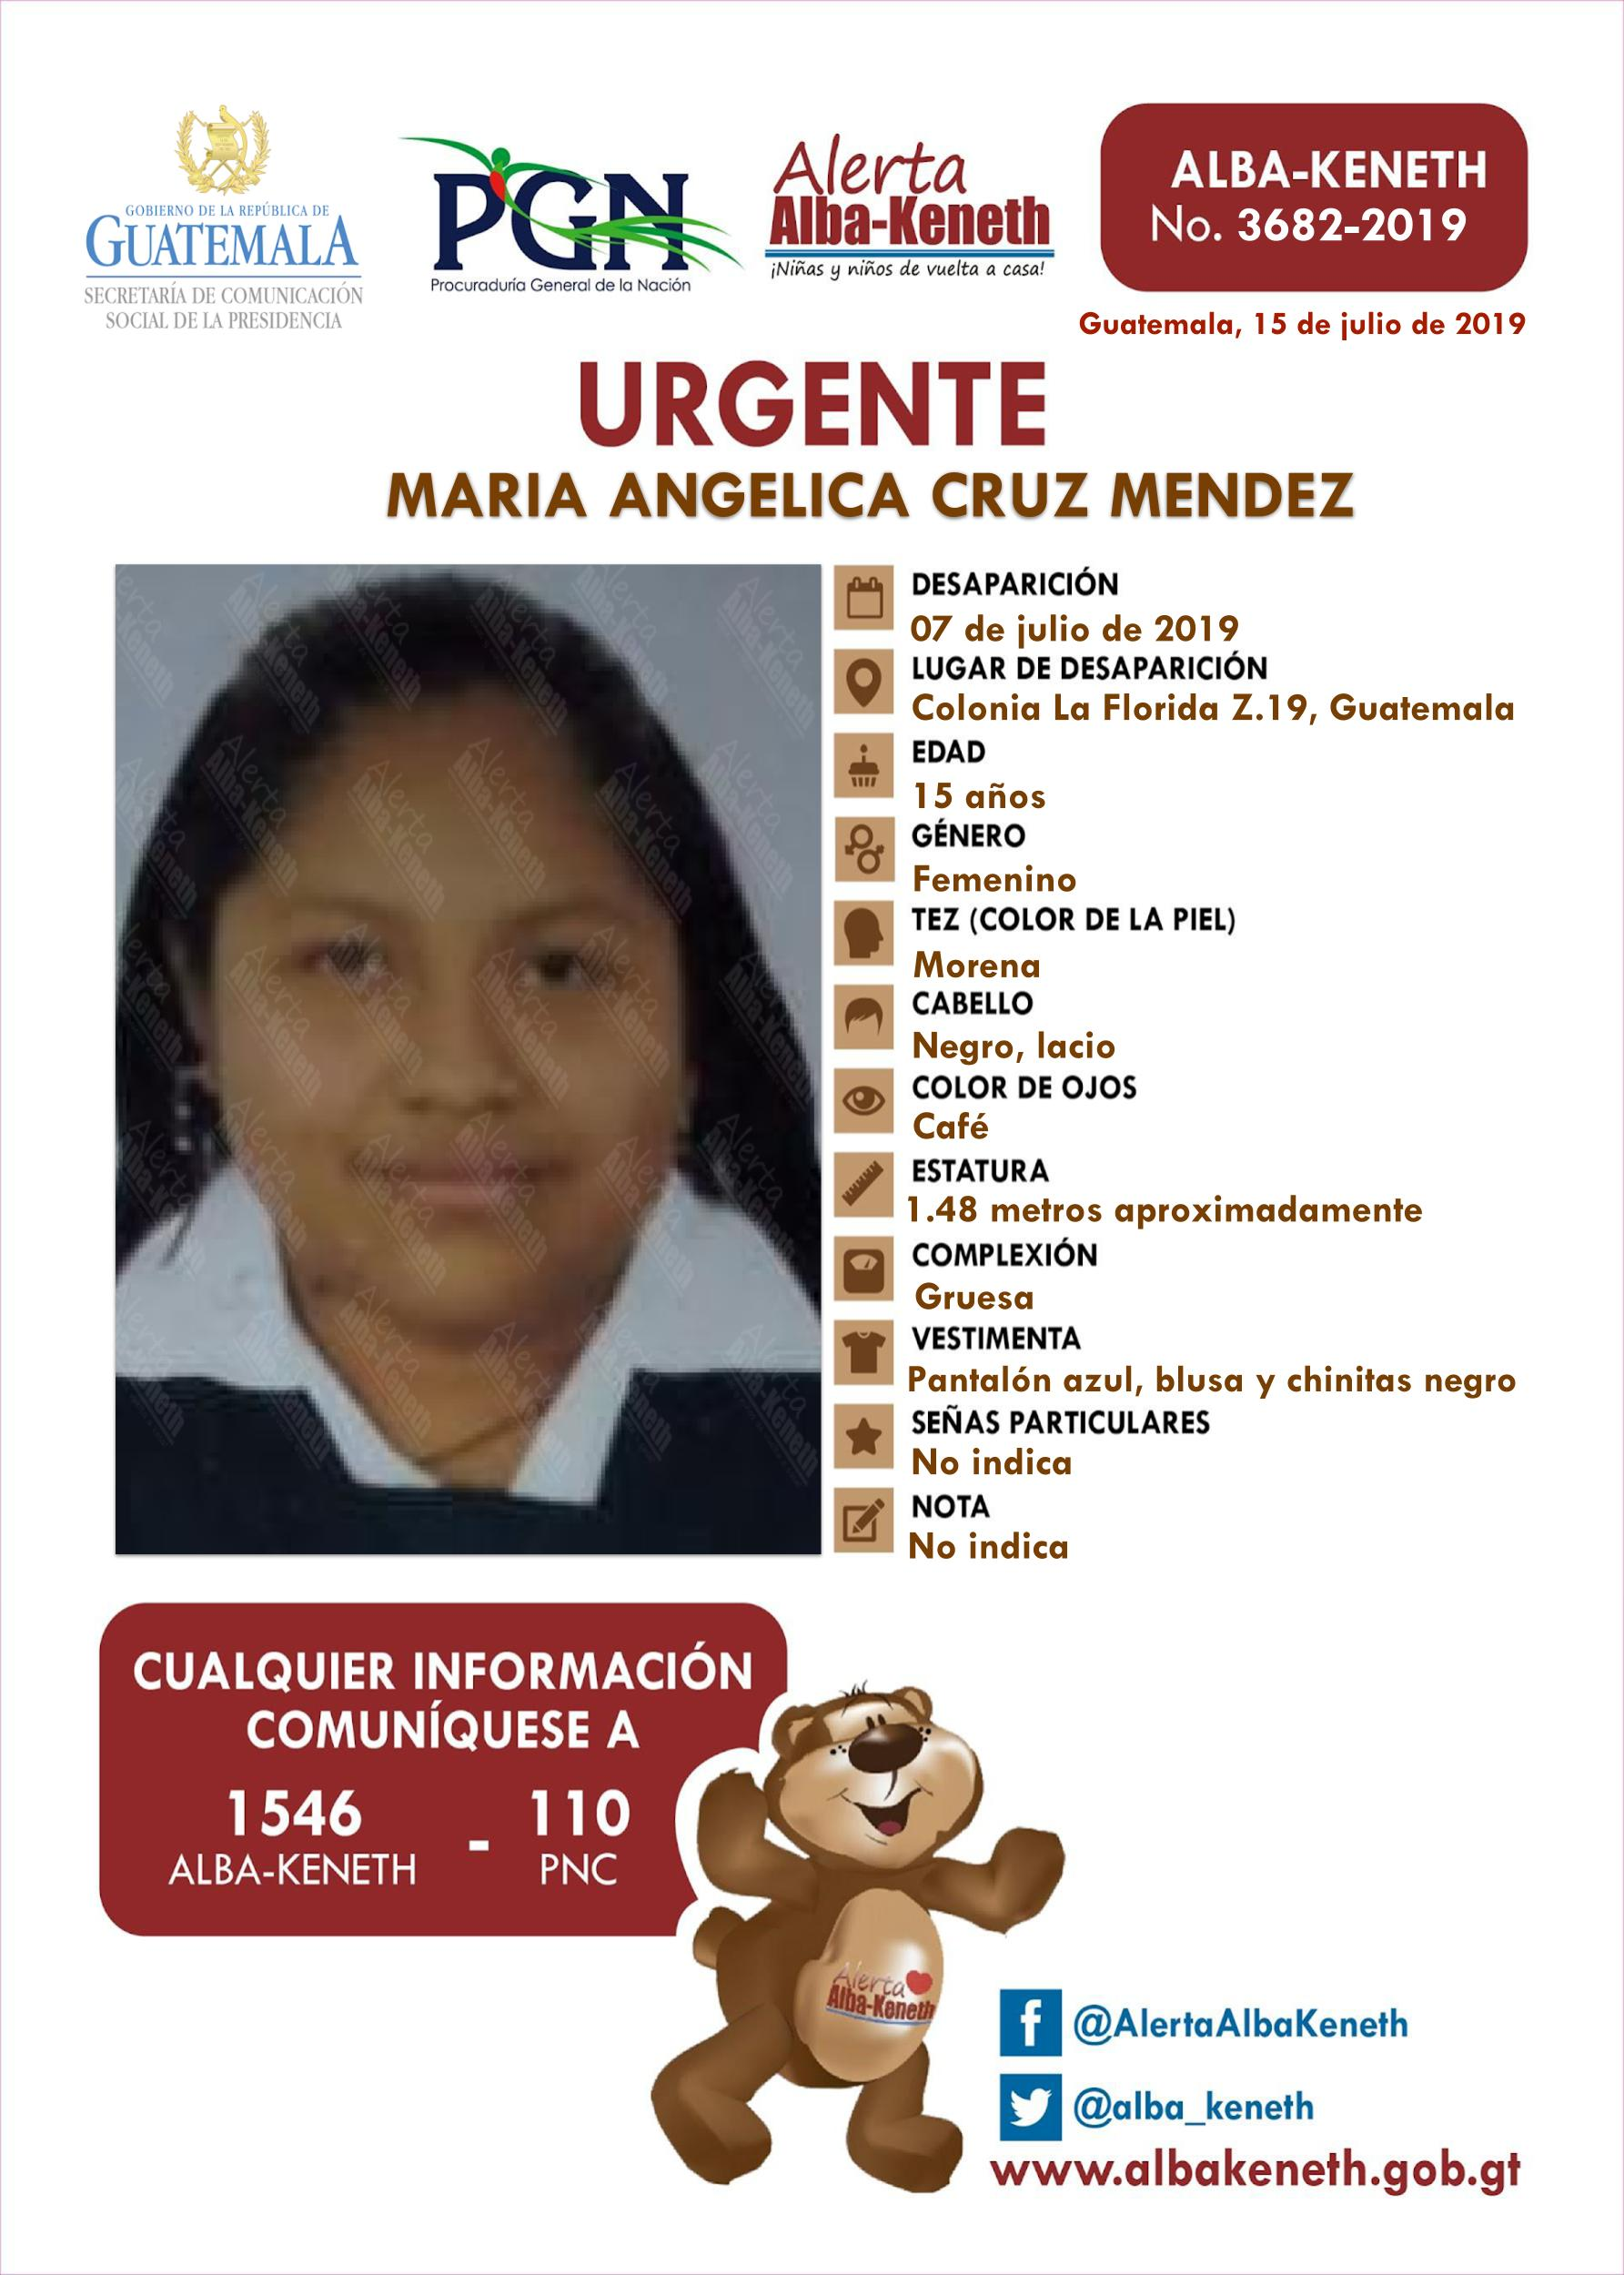 Maria Angelica Cruz Mendez